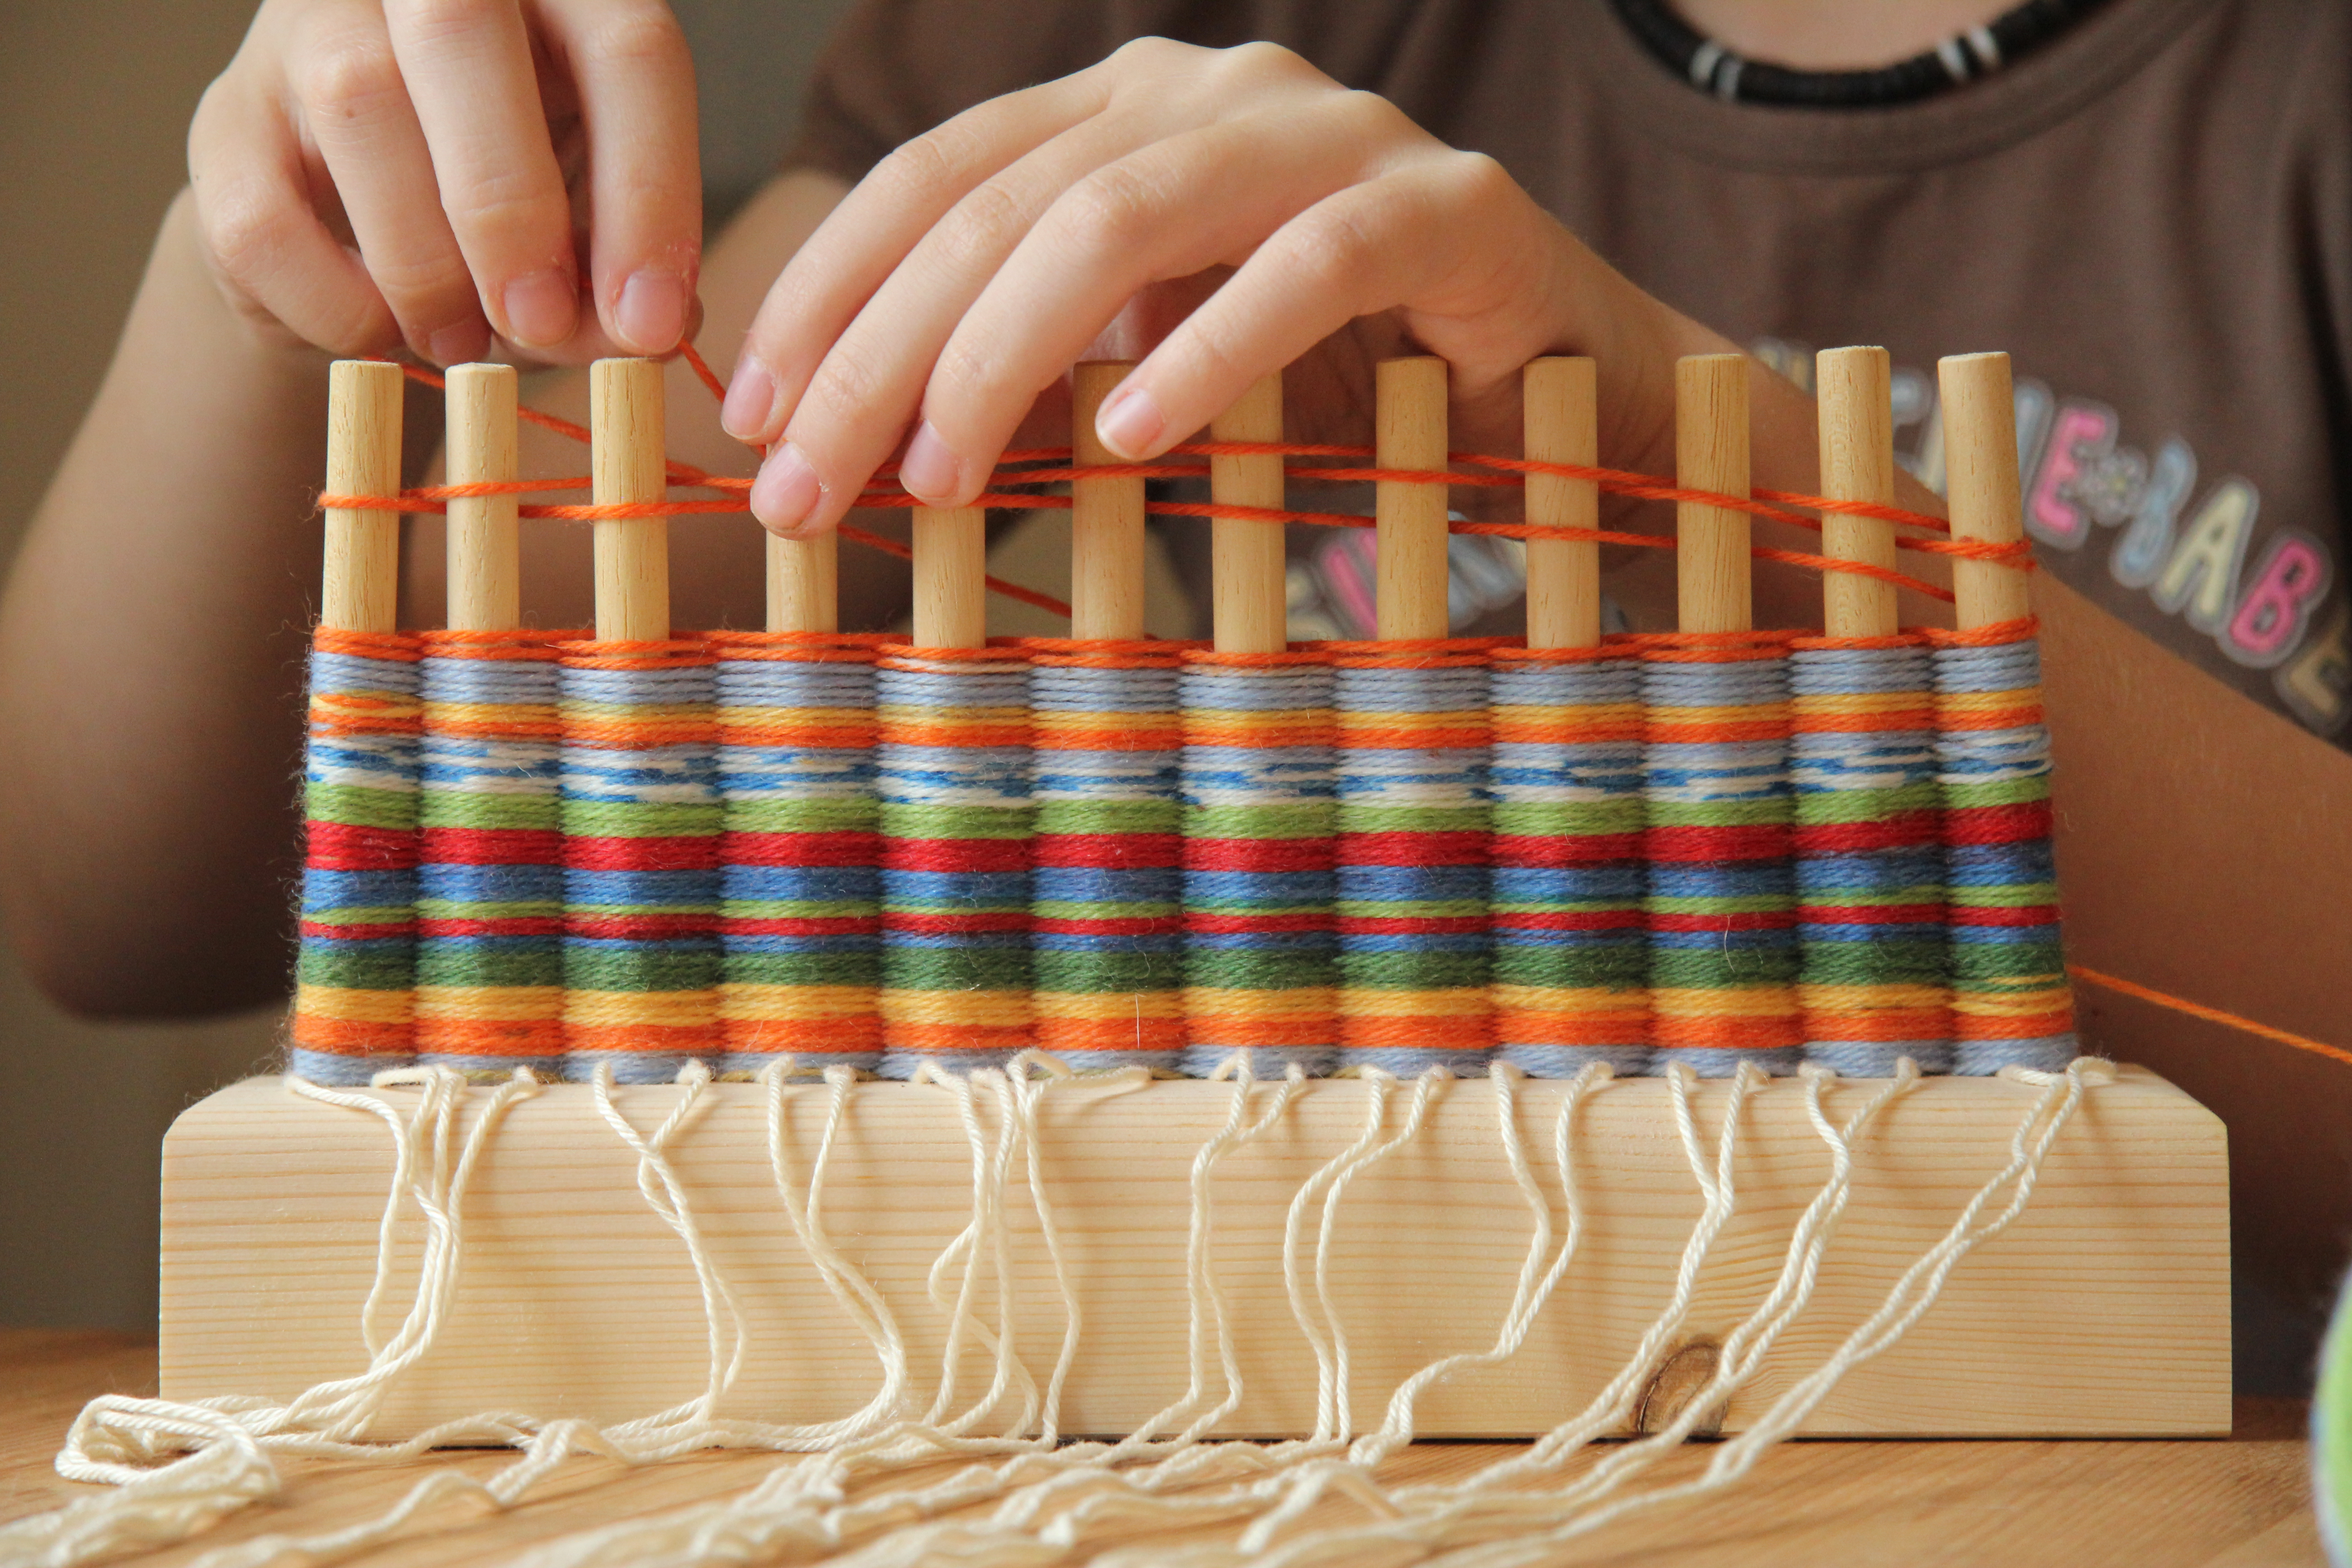 High fashion weaving loom video Boris Becker reveals he was pummelled by then wife Barbara as he